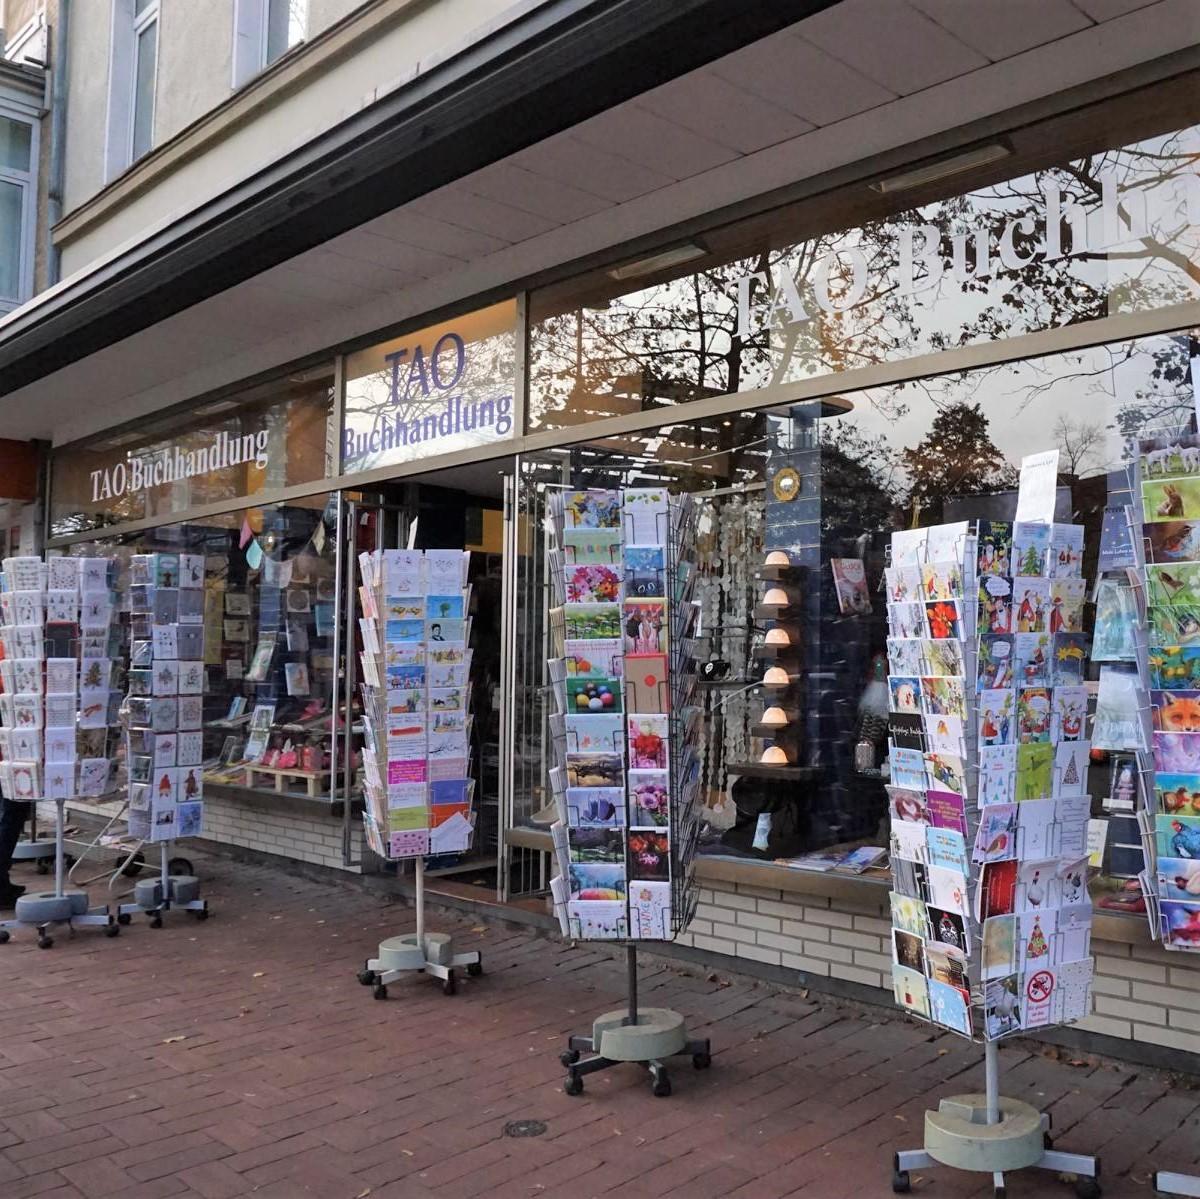 style hannover tao buchhandlung B - Stadtteil-test